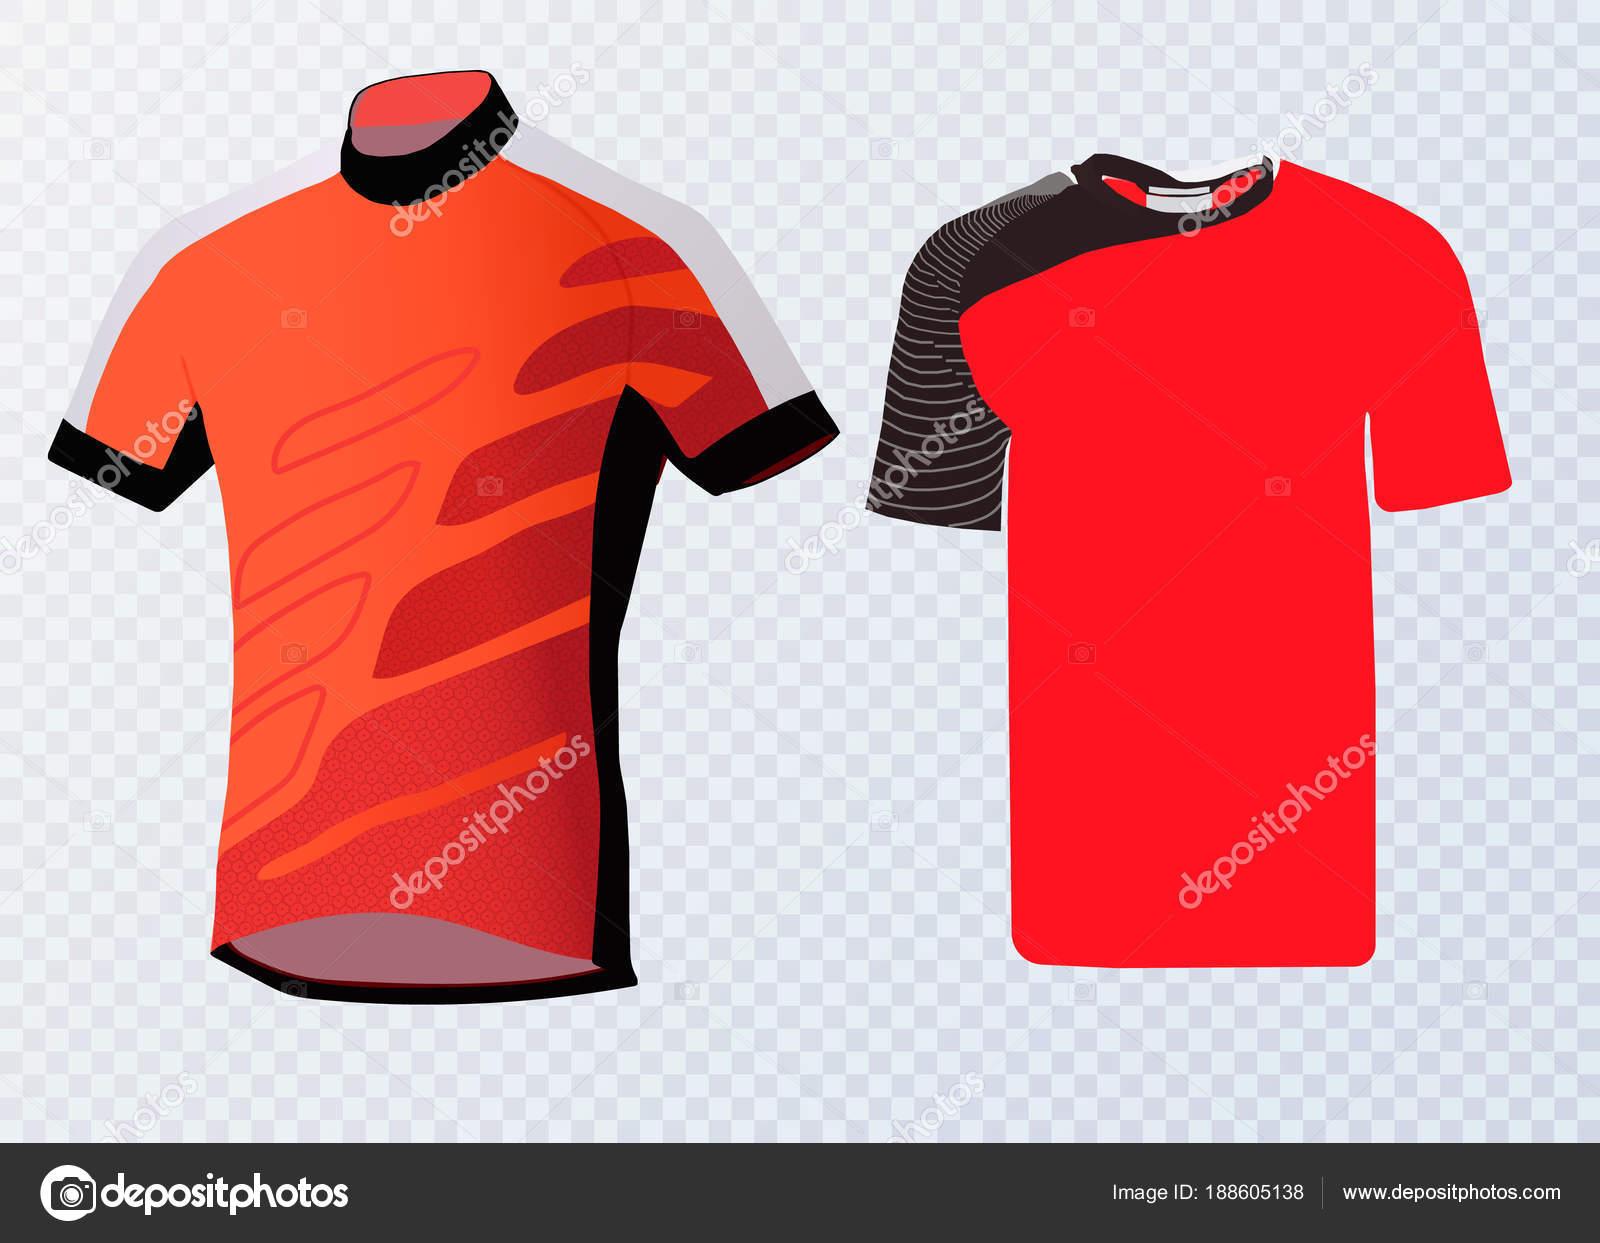 soccer jersey template mock up football uniform for football club